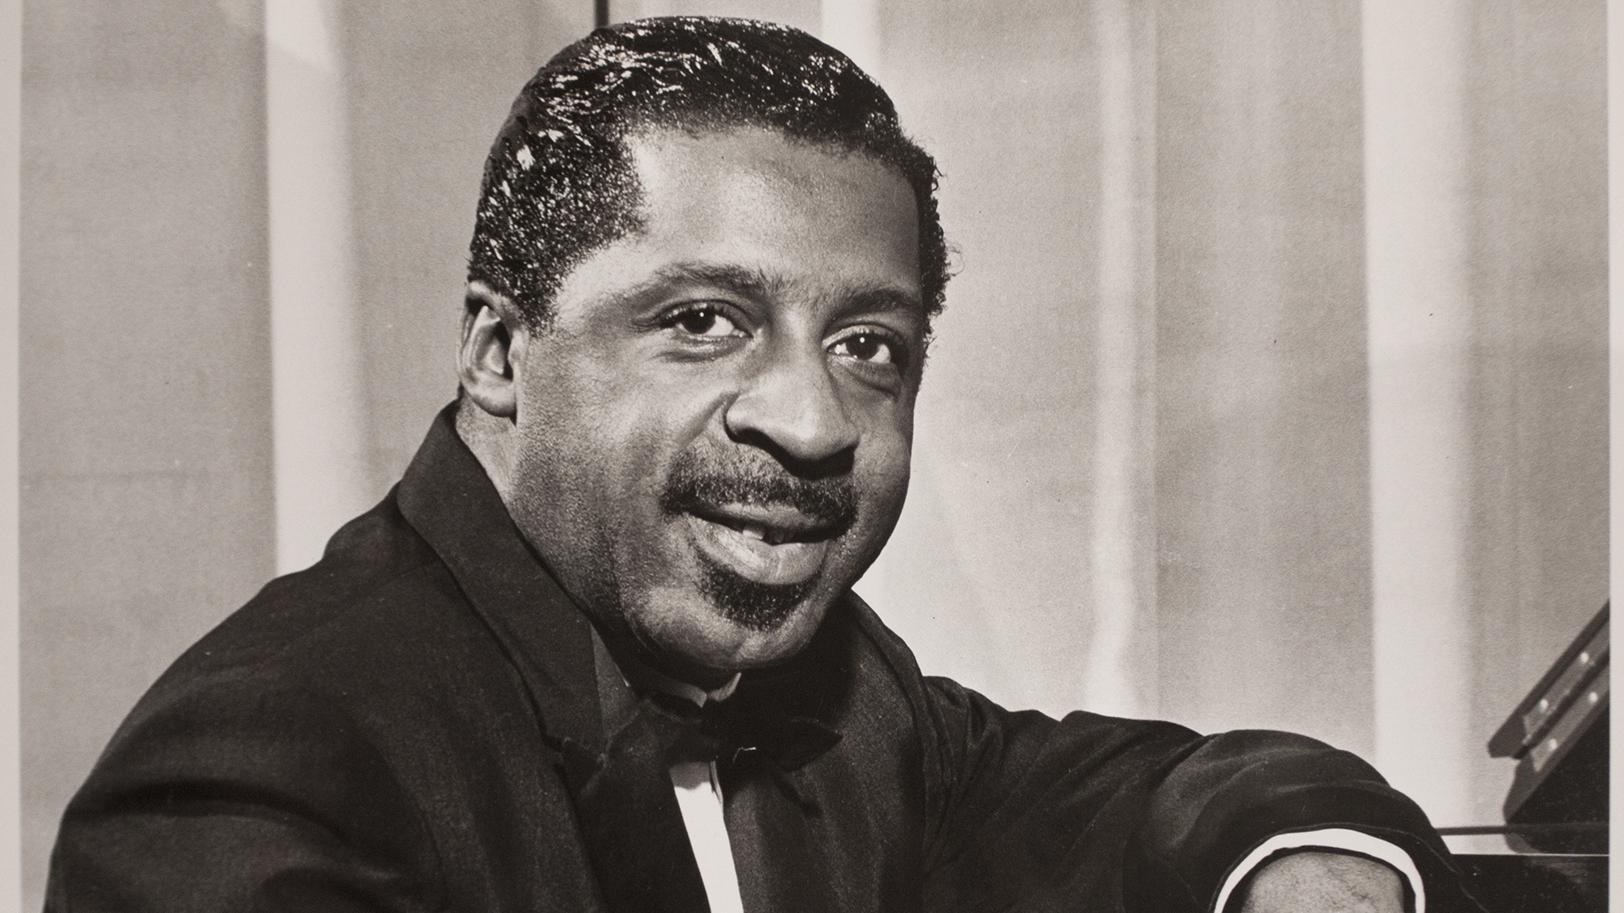 The Erroll Garner Jazz Project Restores A 'Profound Cultural Gift'